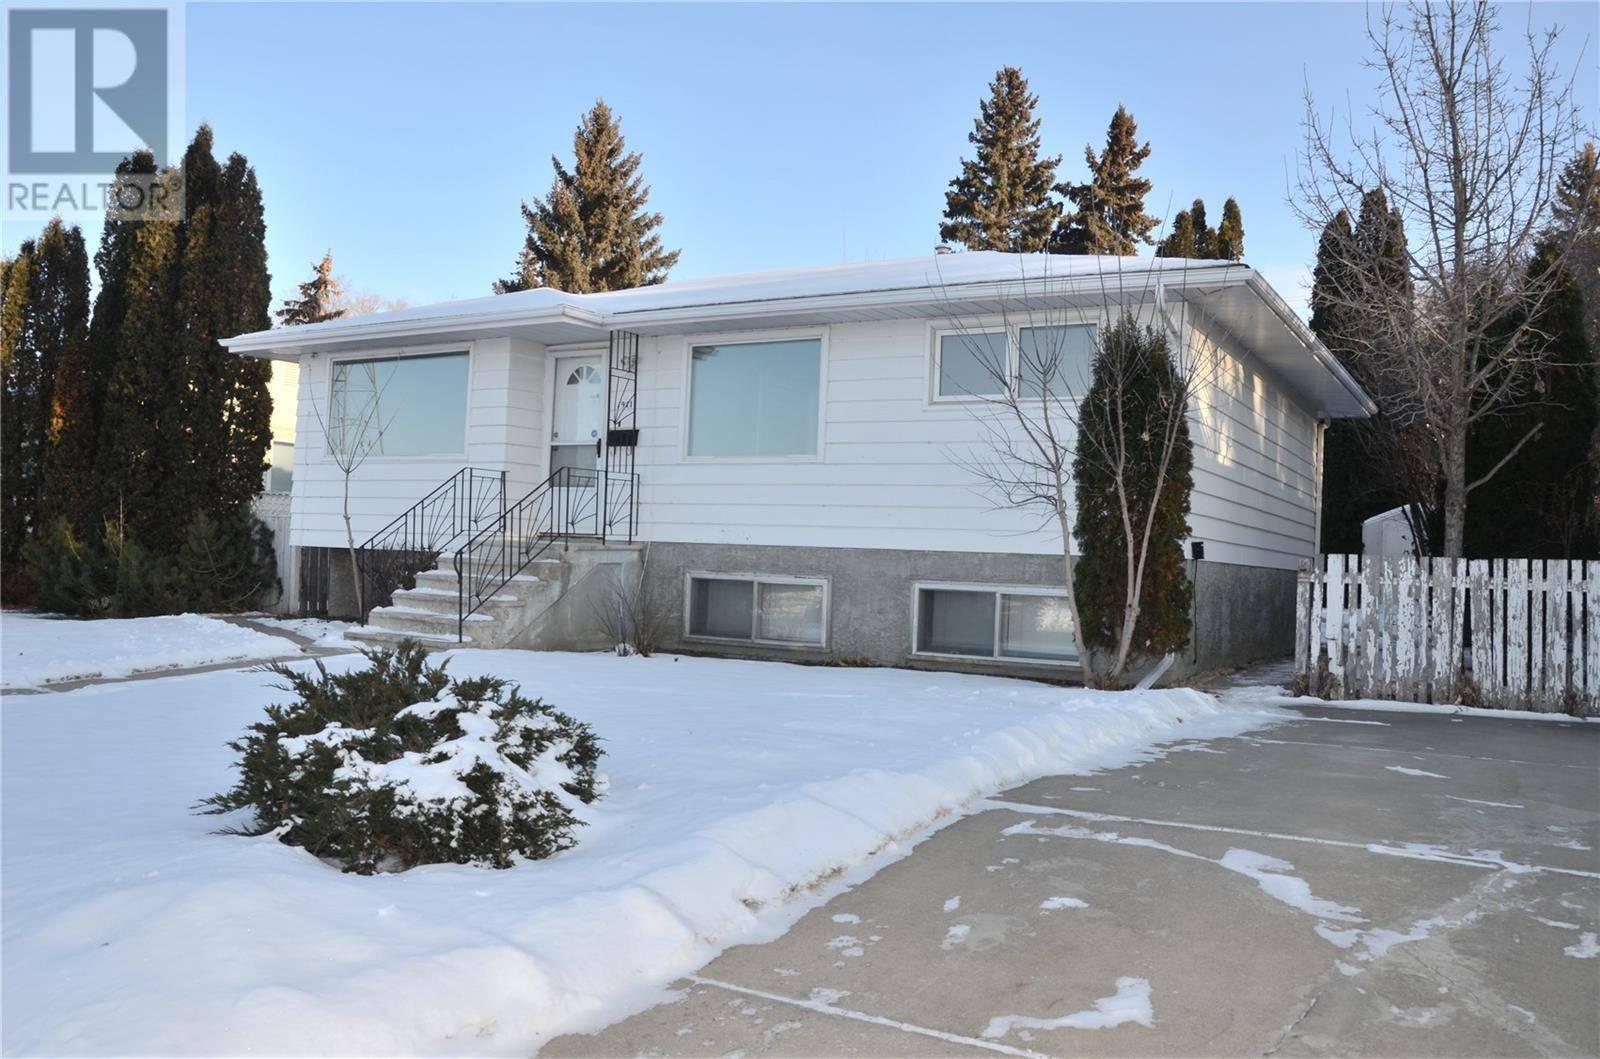 House for sale at 1911 St Henry Ave Saskatoon Saskatchewan - MLS: SK793944